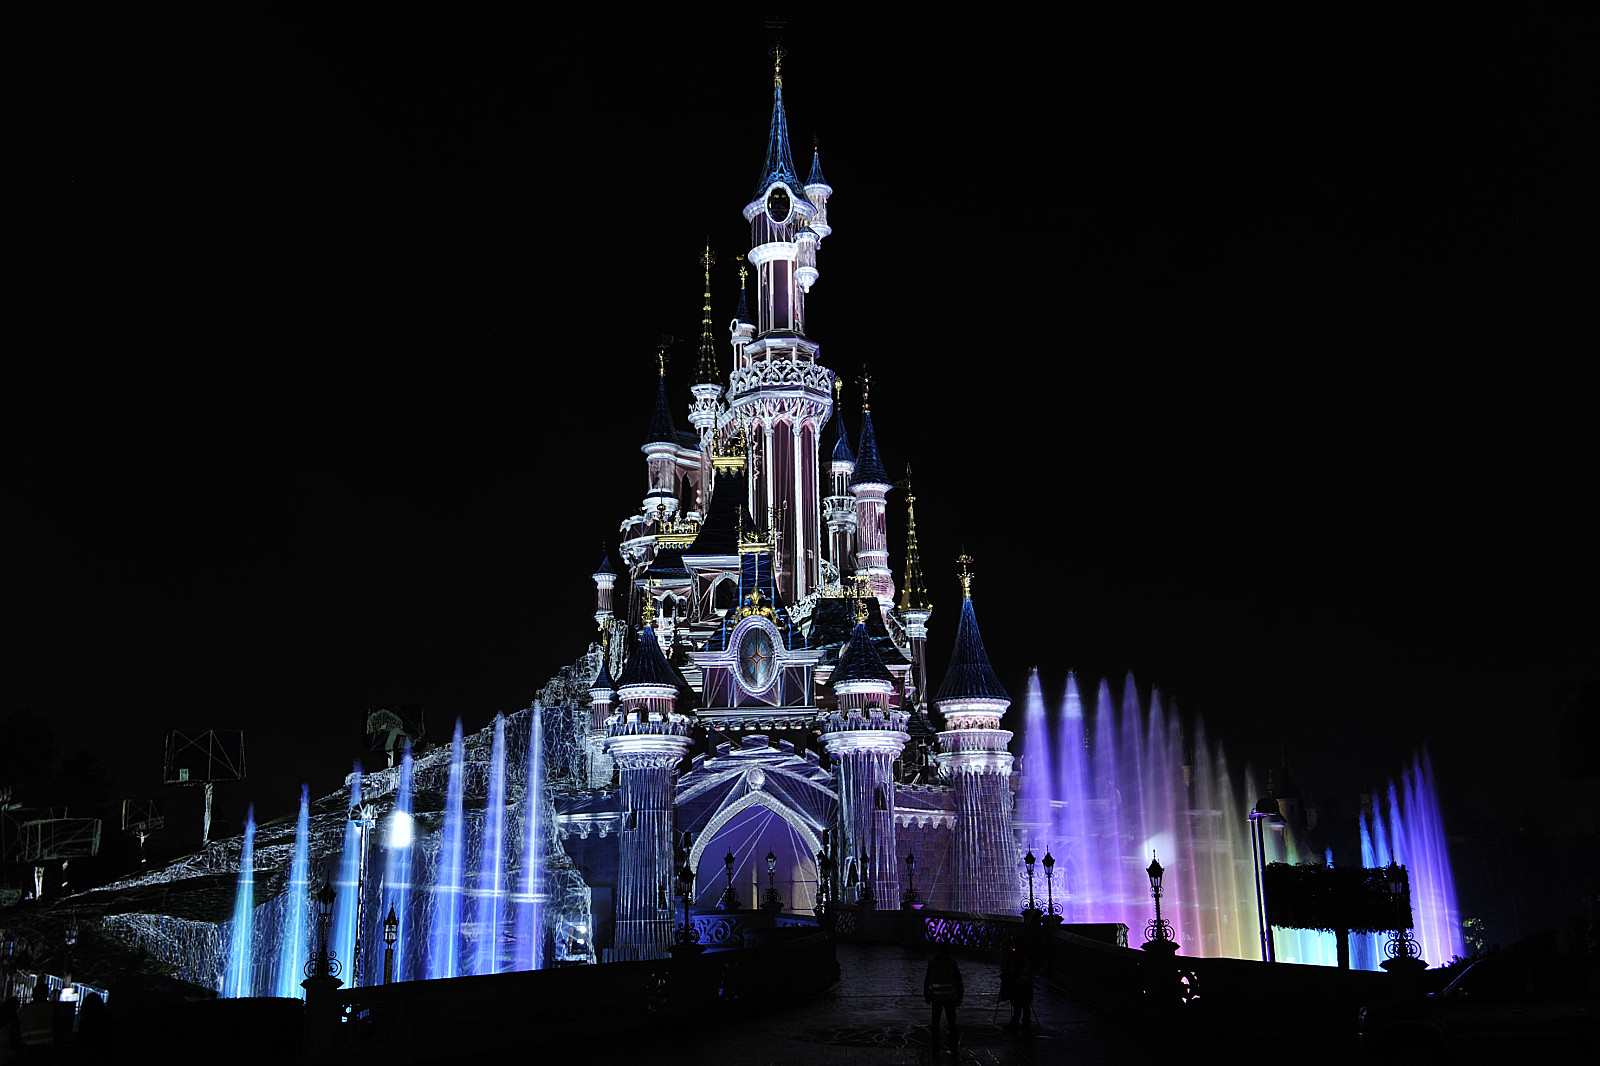 Disneyland Castle Paris Black Night wallpaper 1600x1066 45142 1600x1066